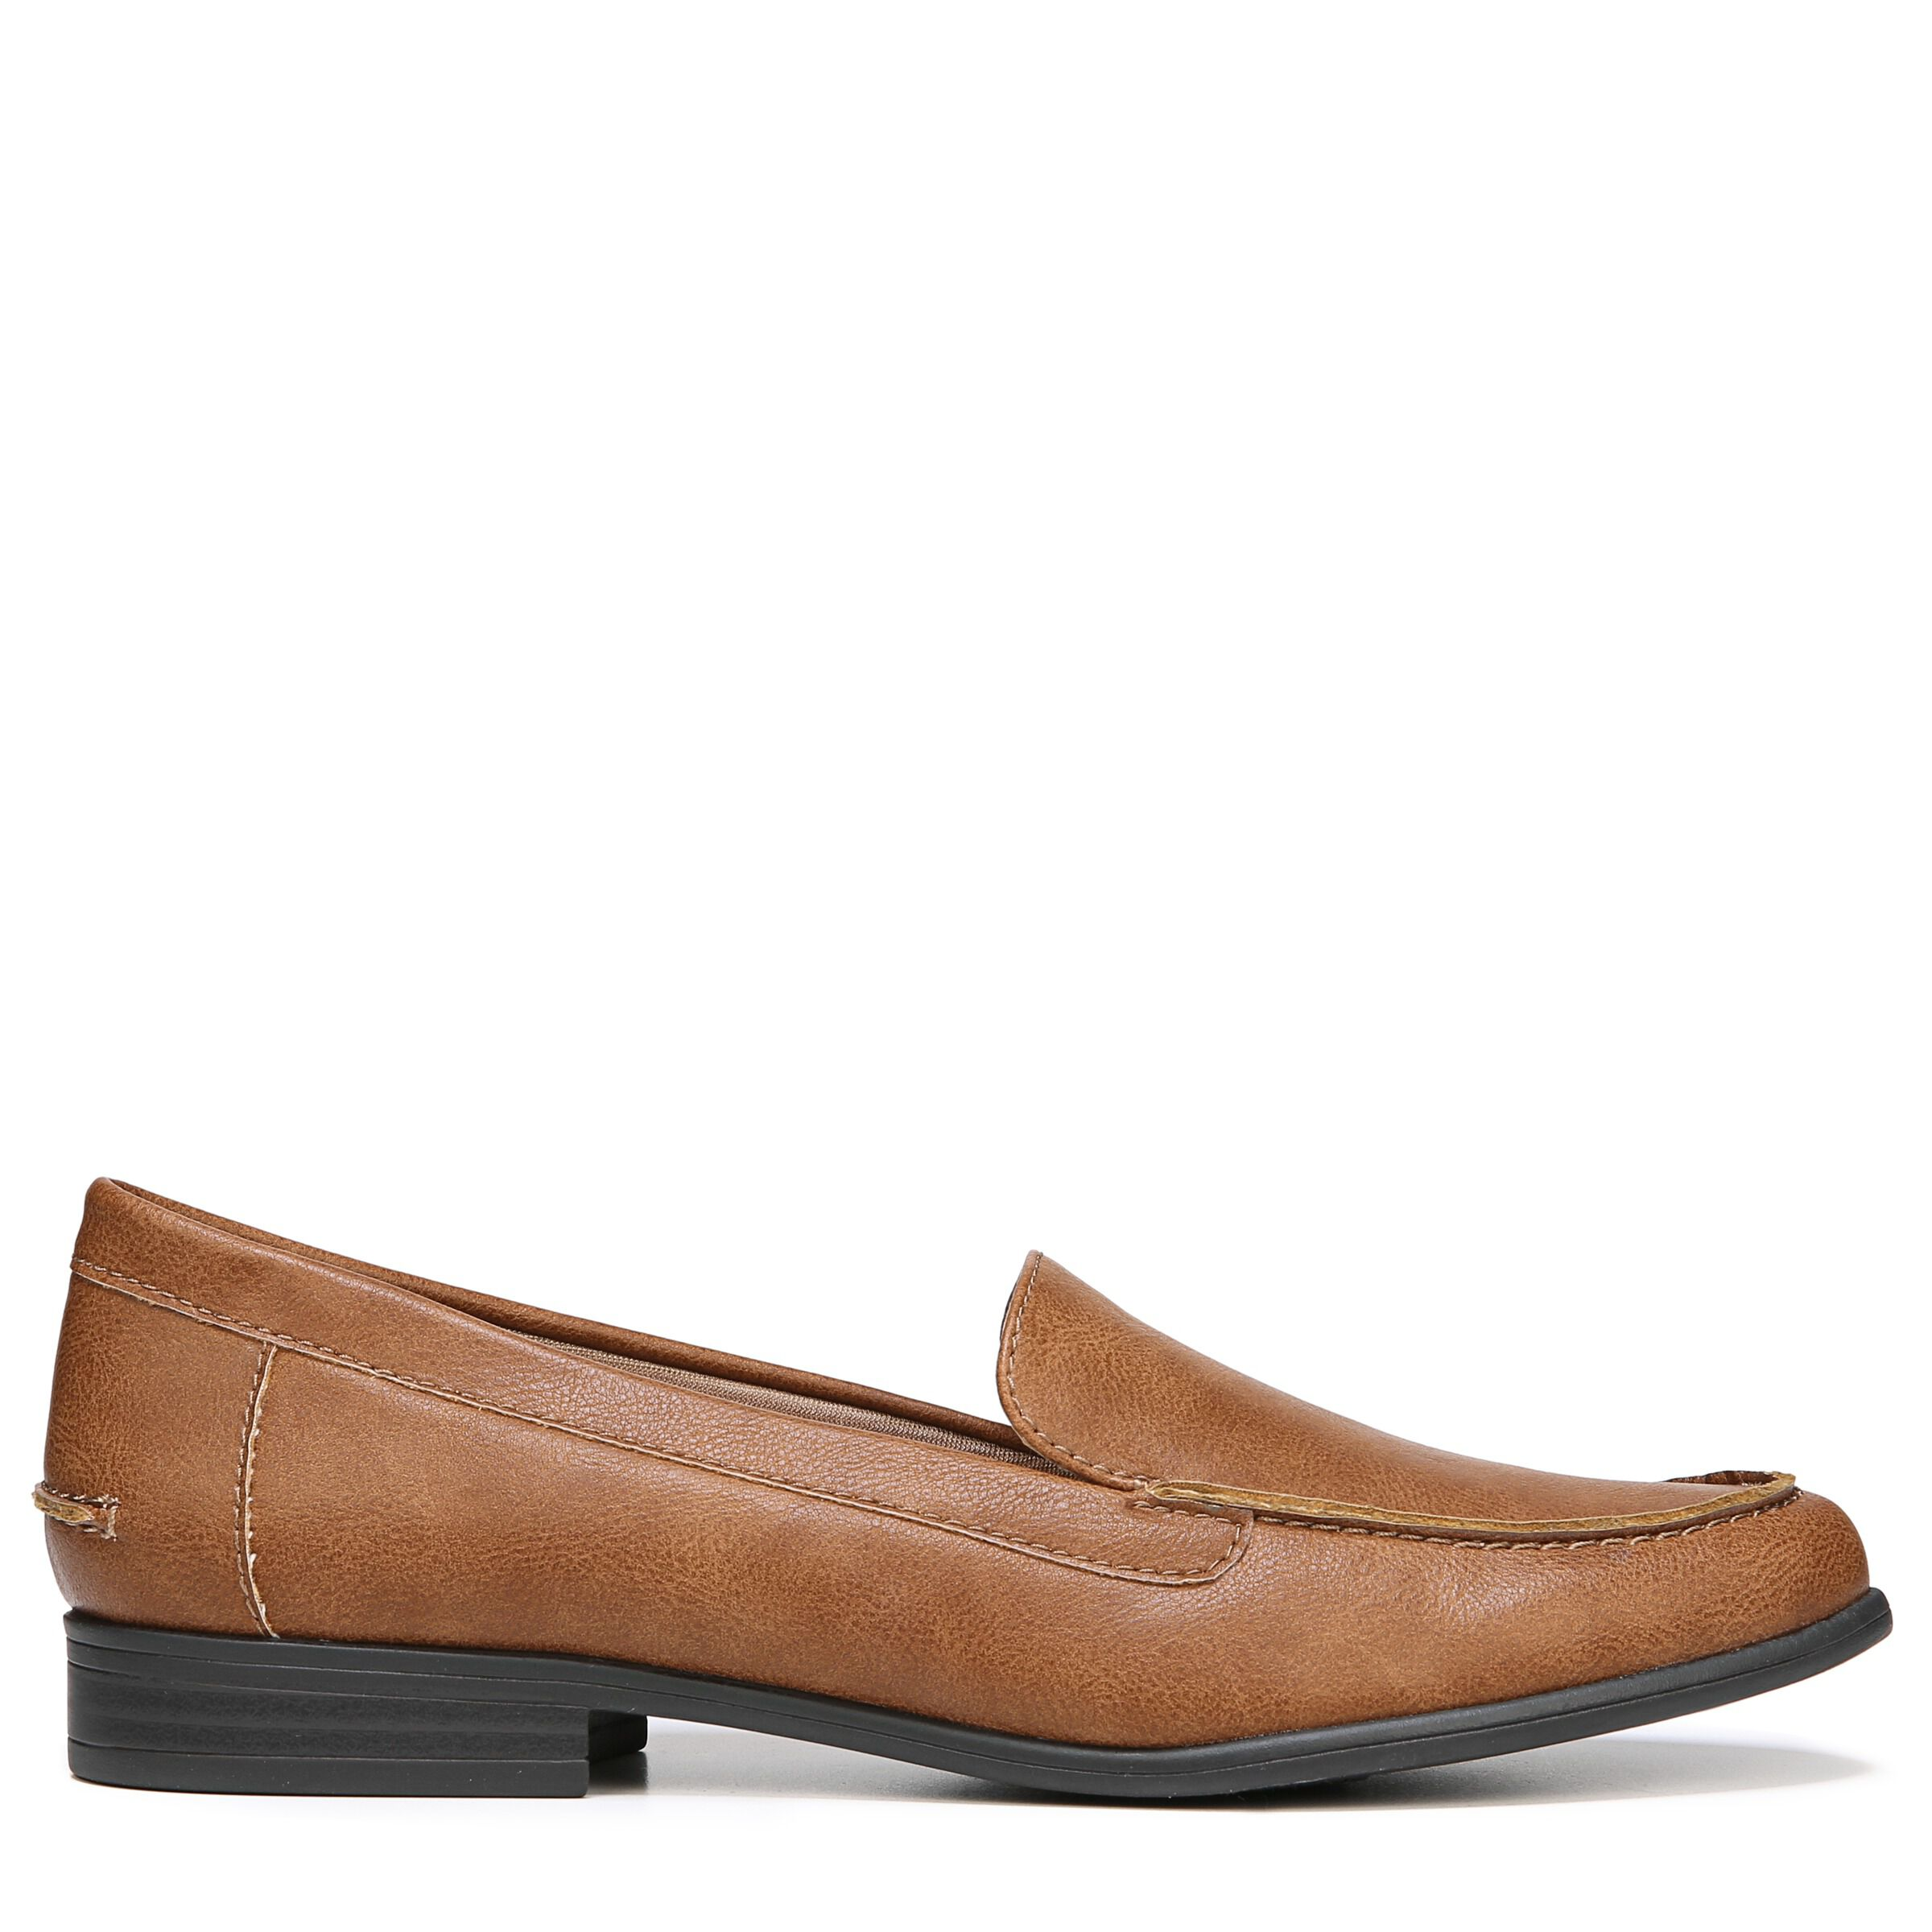 Women's LifeStride Margot Shoes Tan